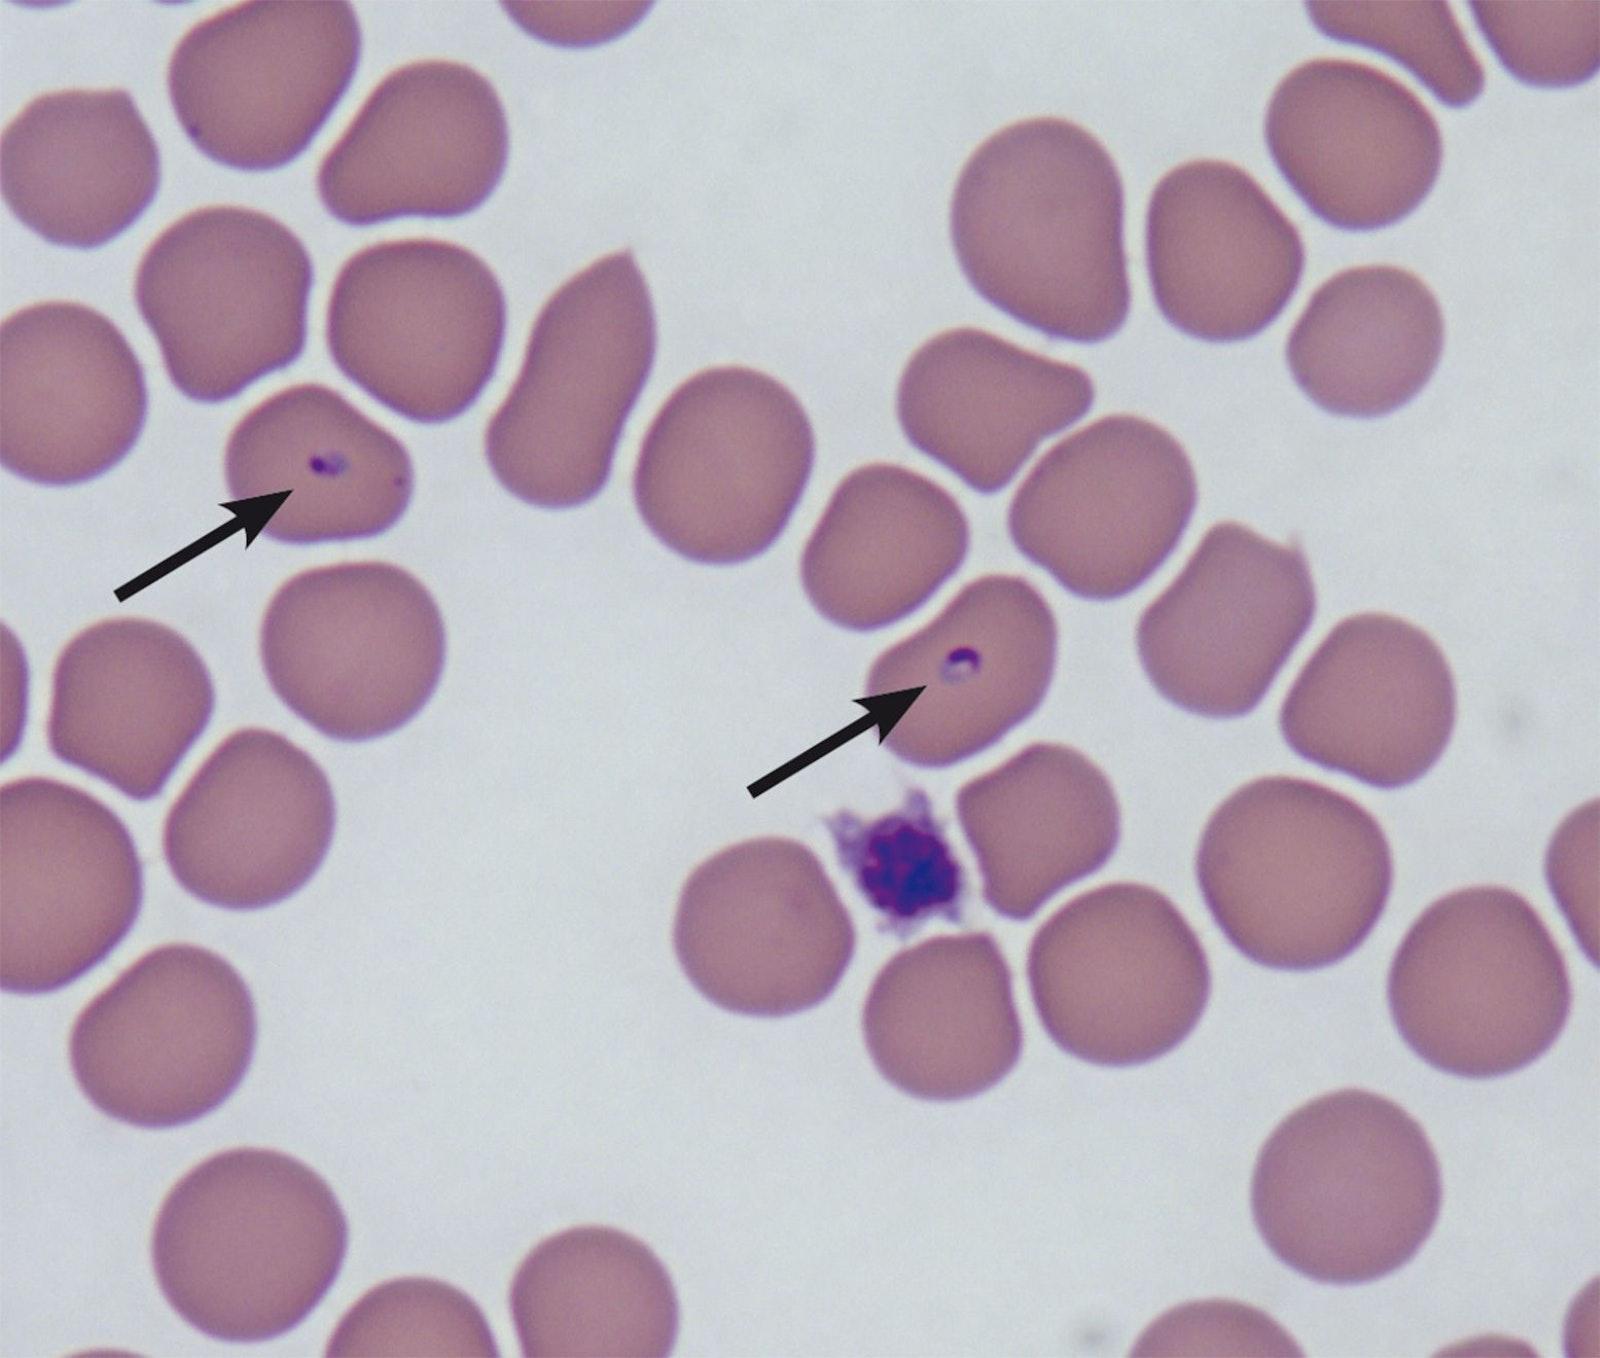 Intrazelluläre Trophozoiten von Babesia felis